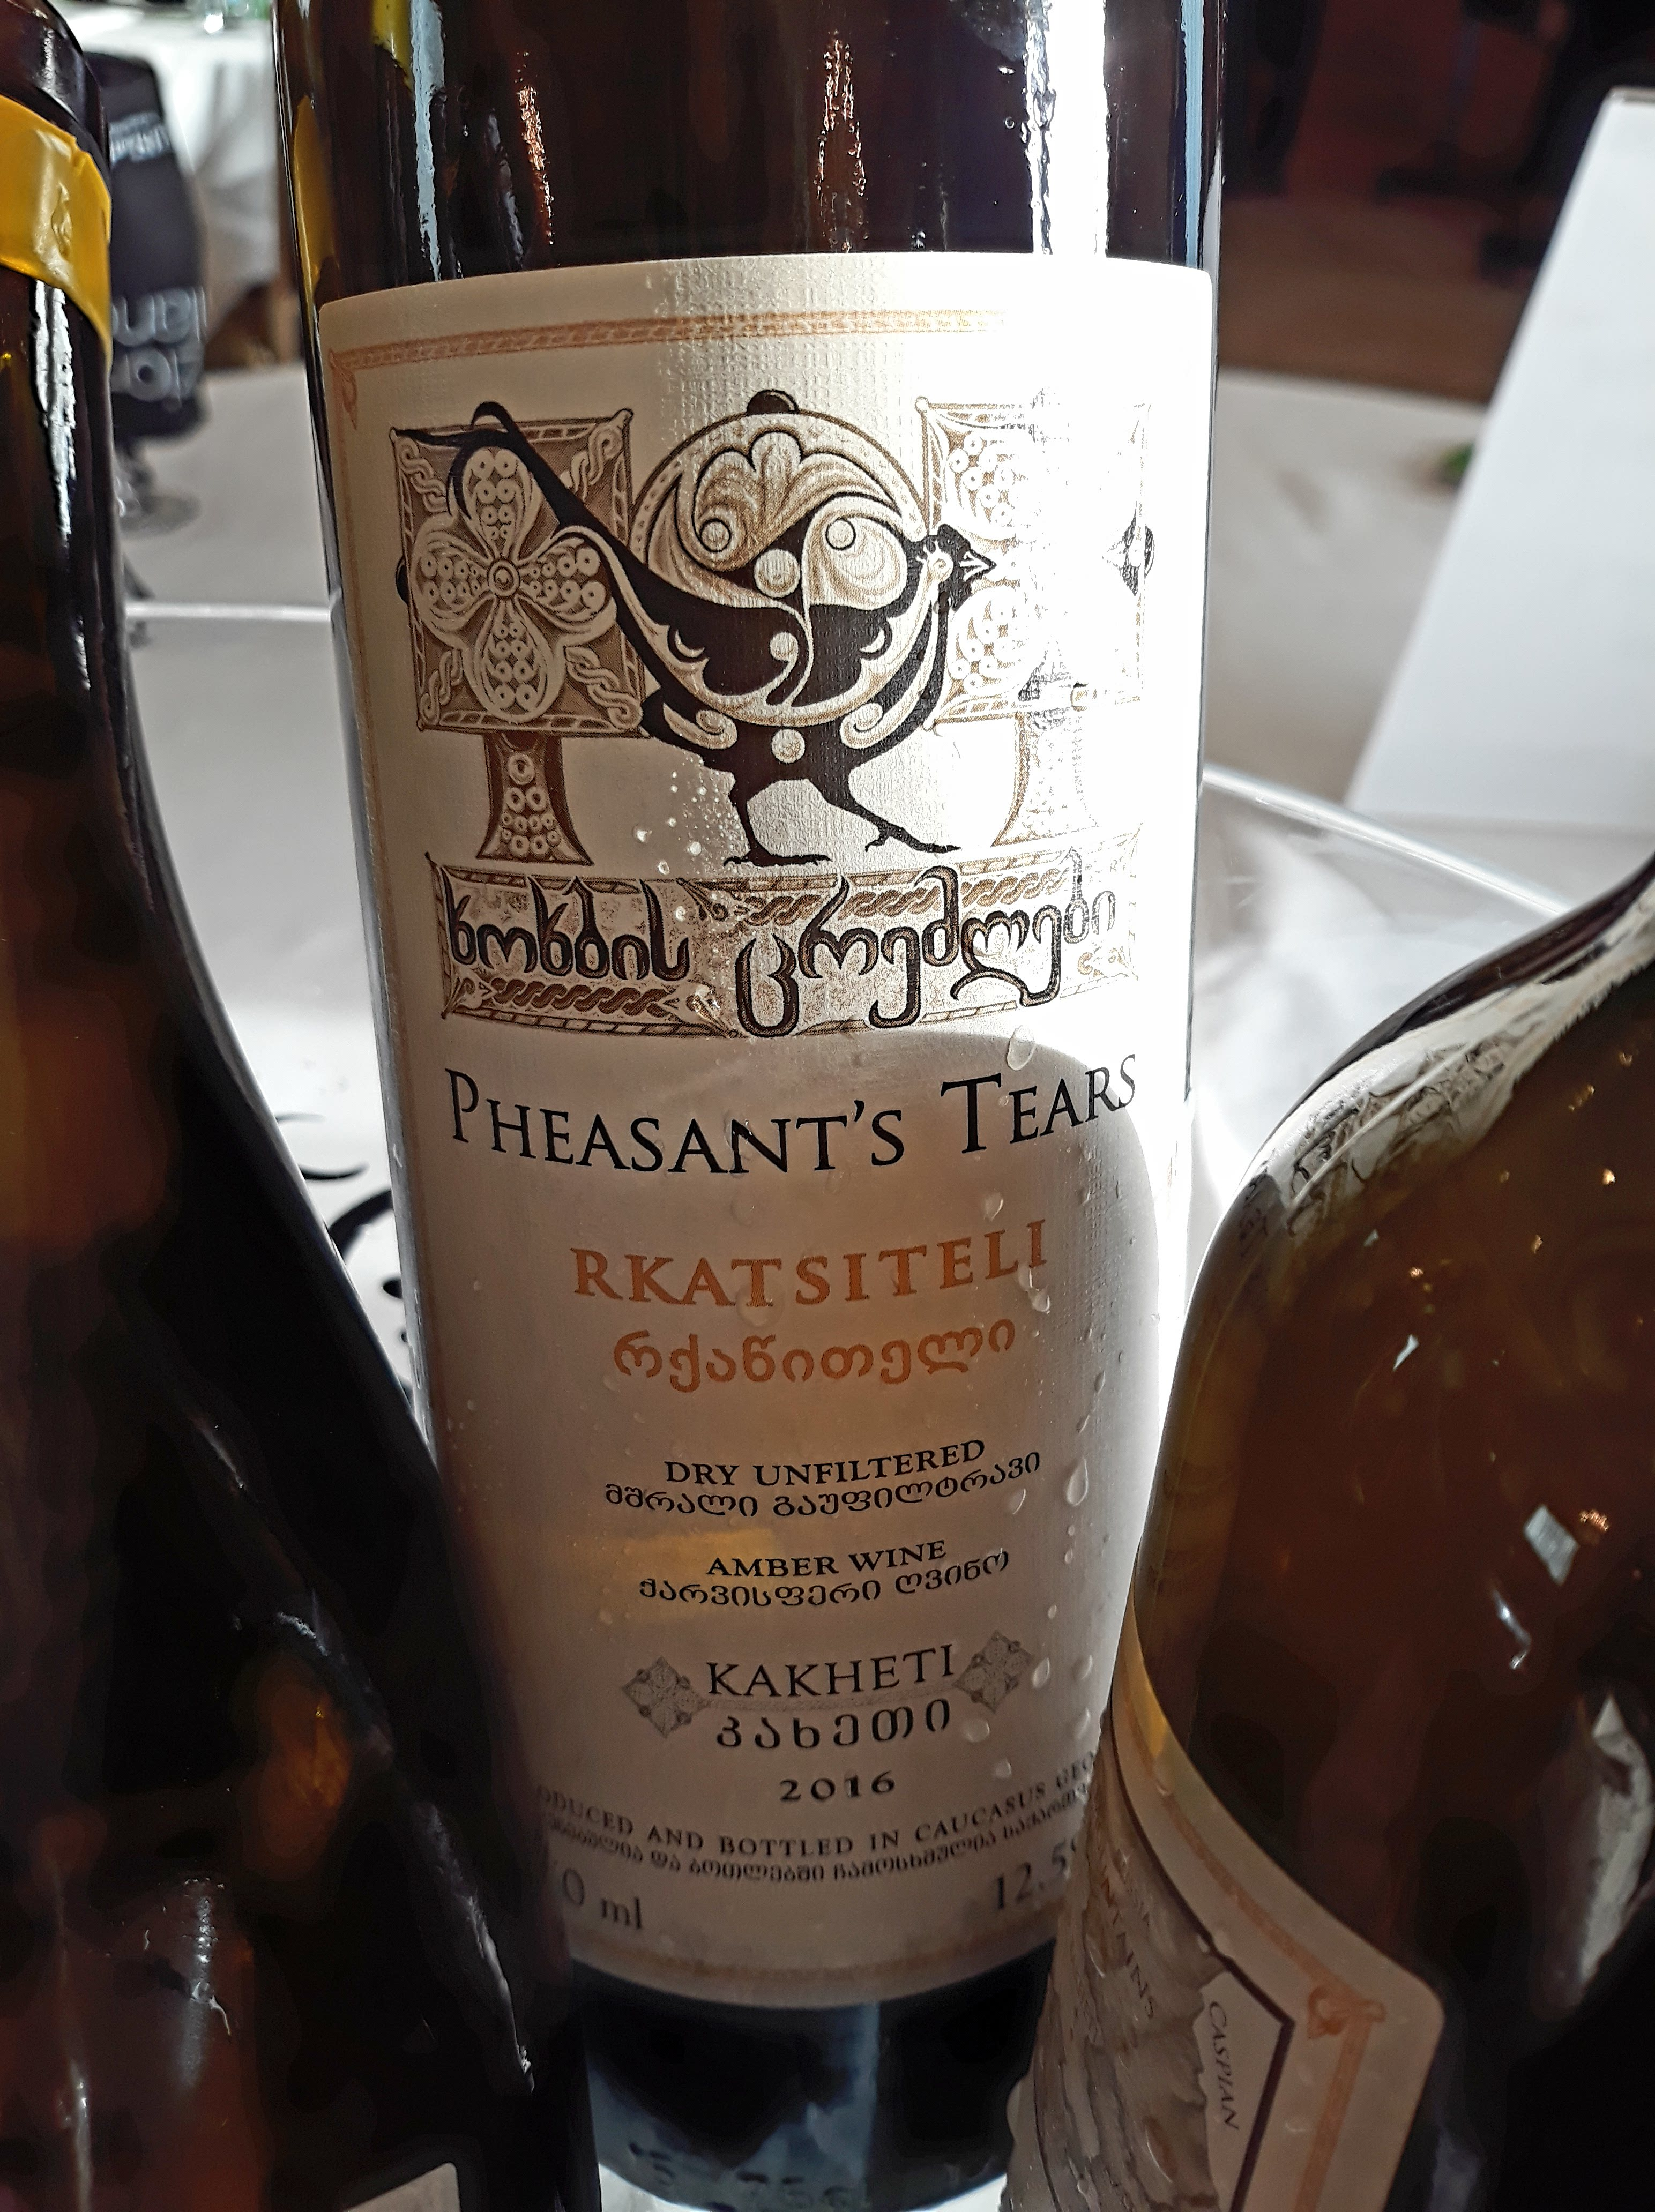 Rkatsiteli 2016 - Pheasant's Tears